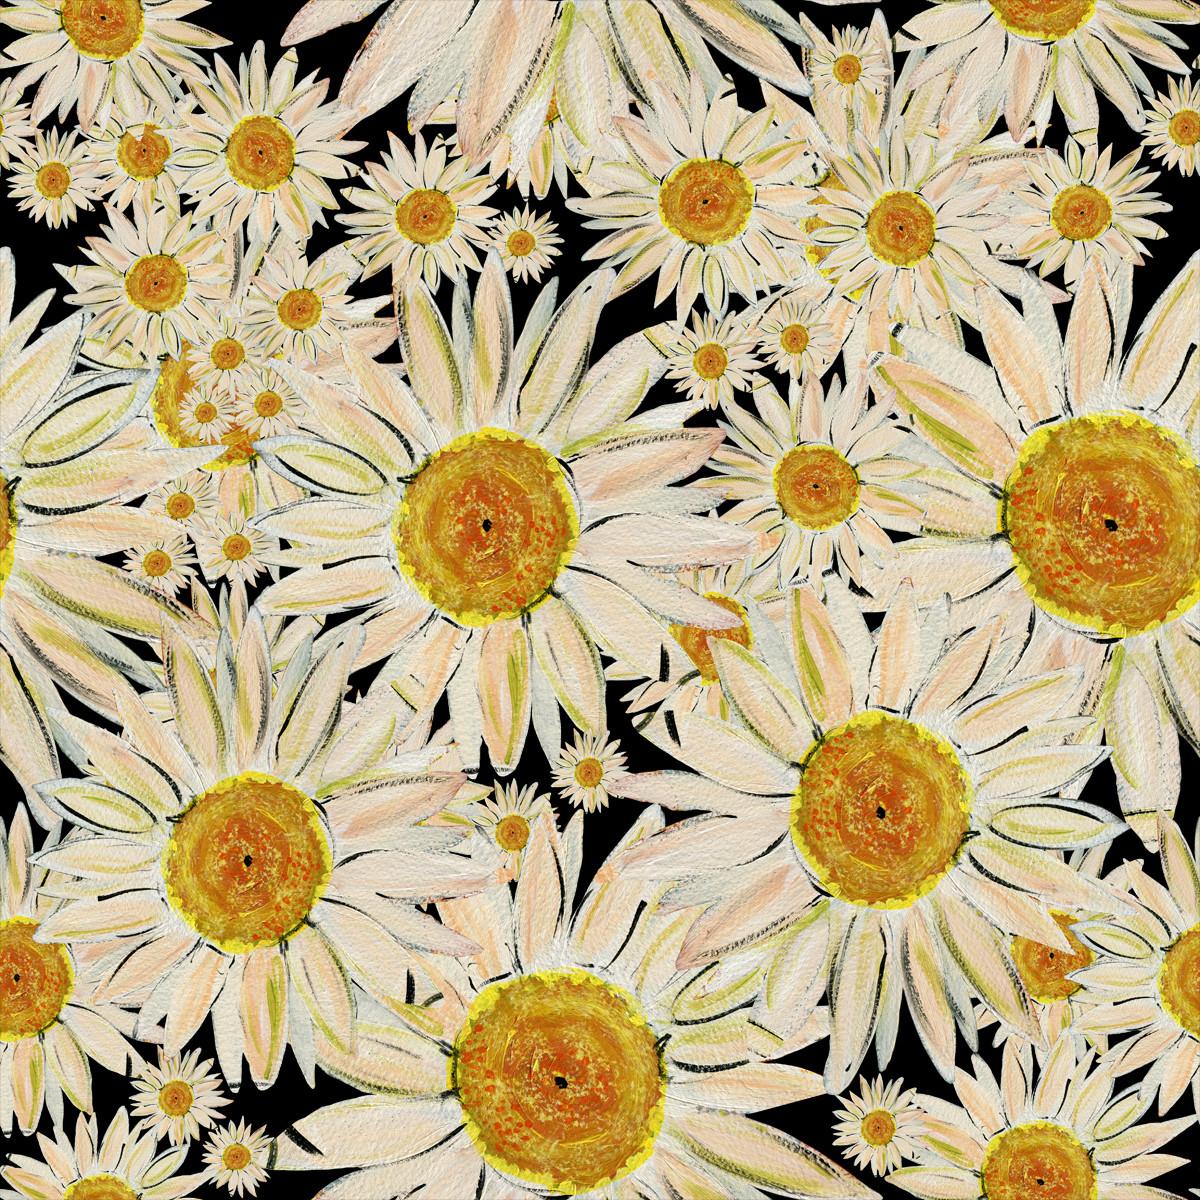 Daisy print 4 web.jpg